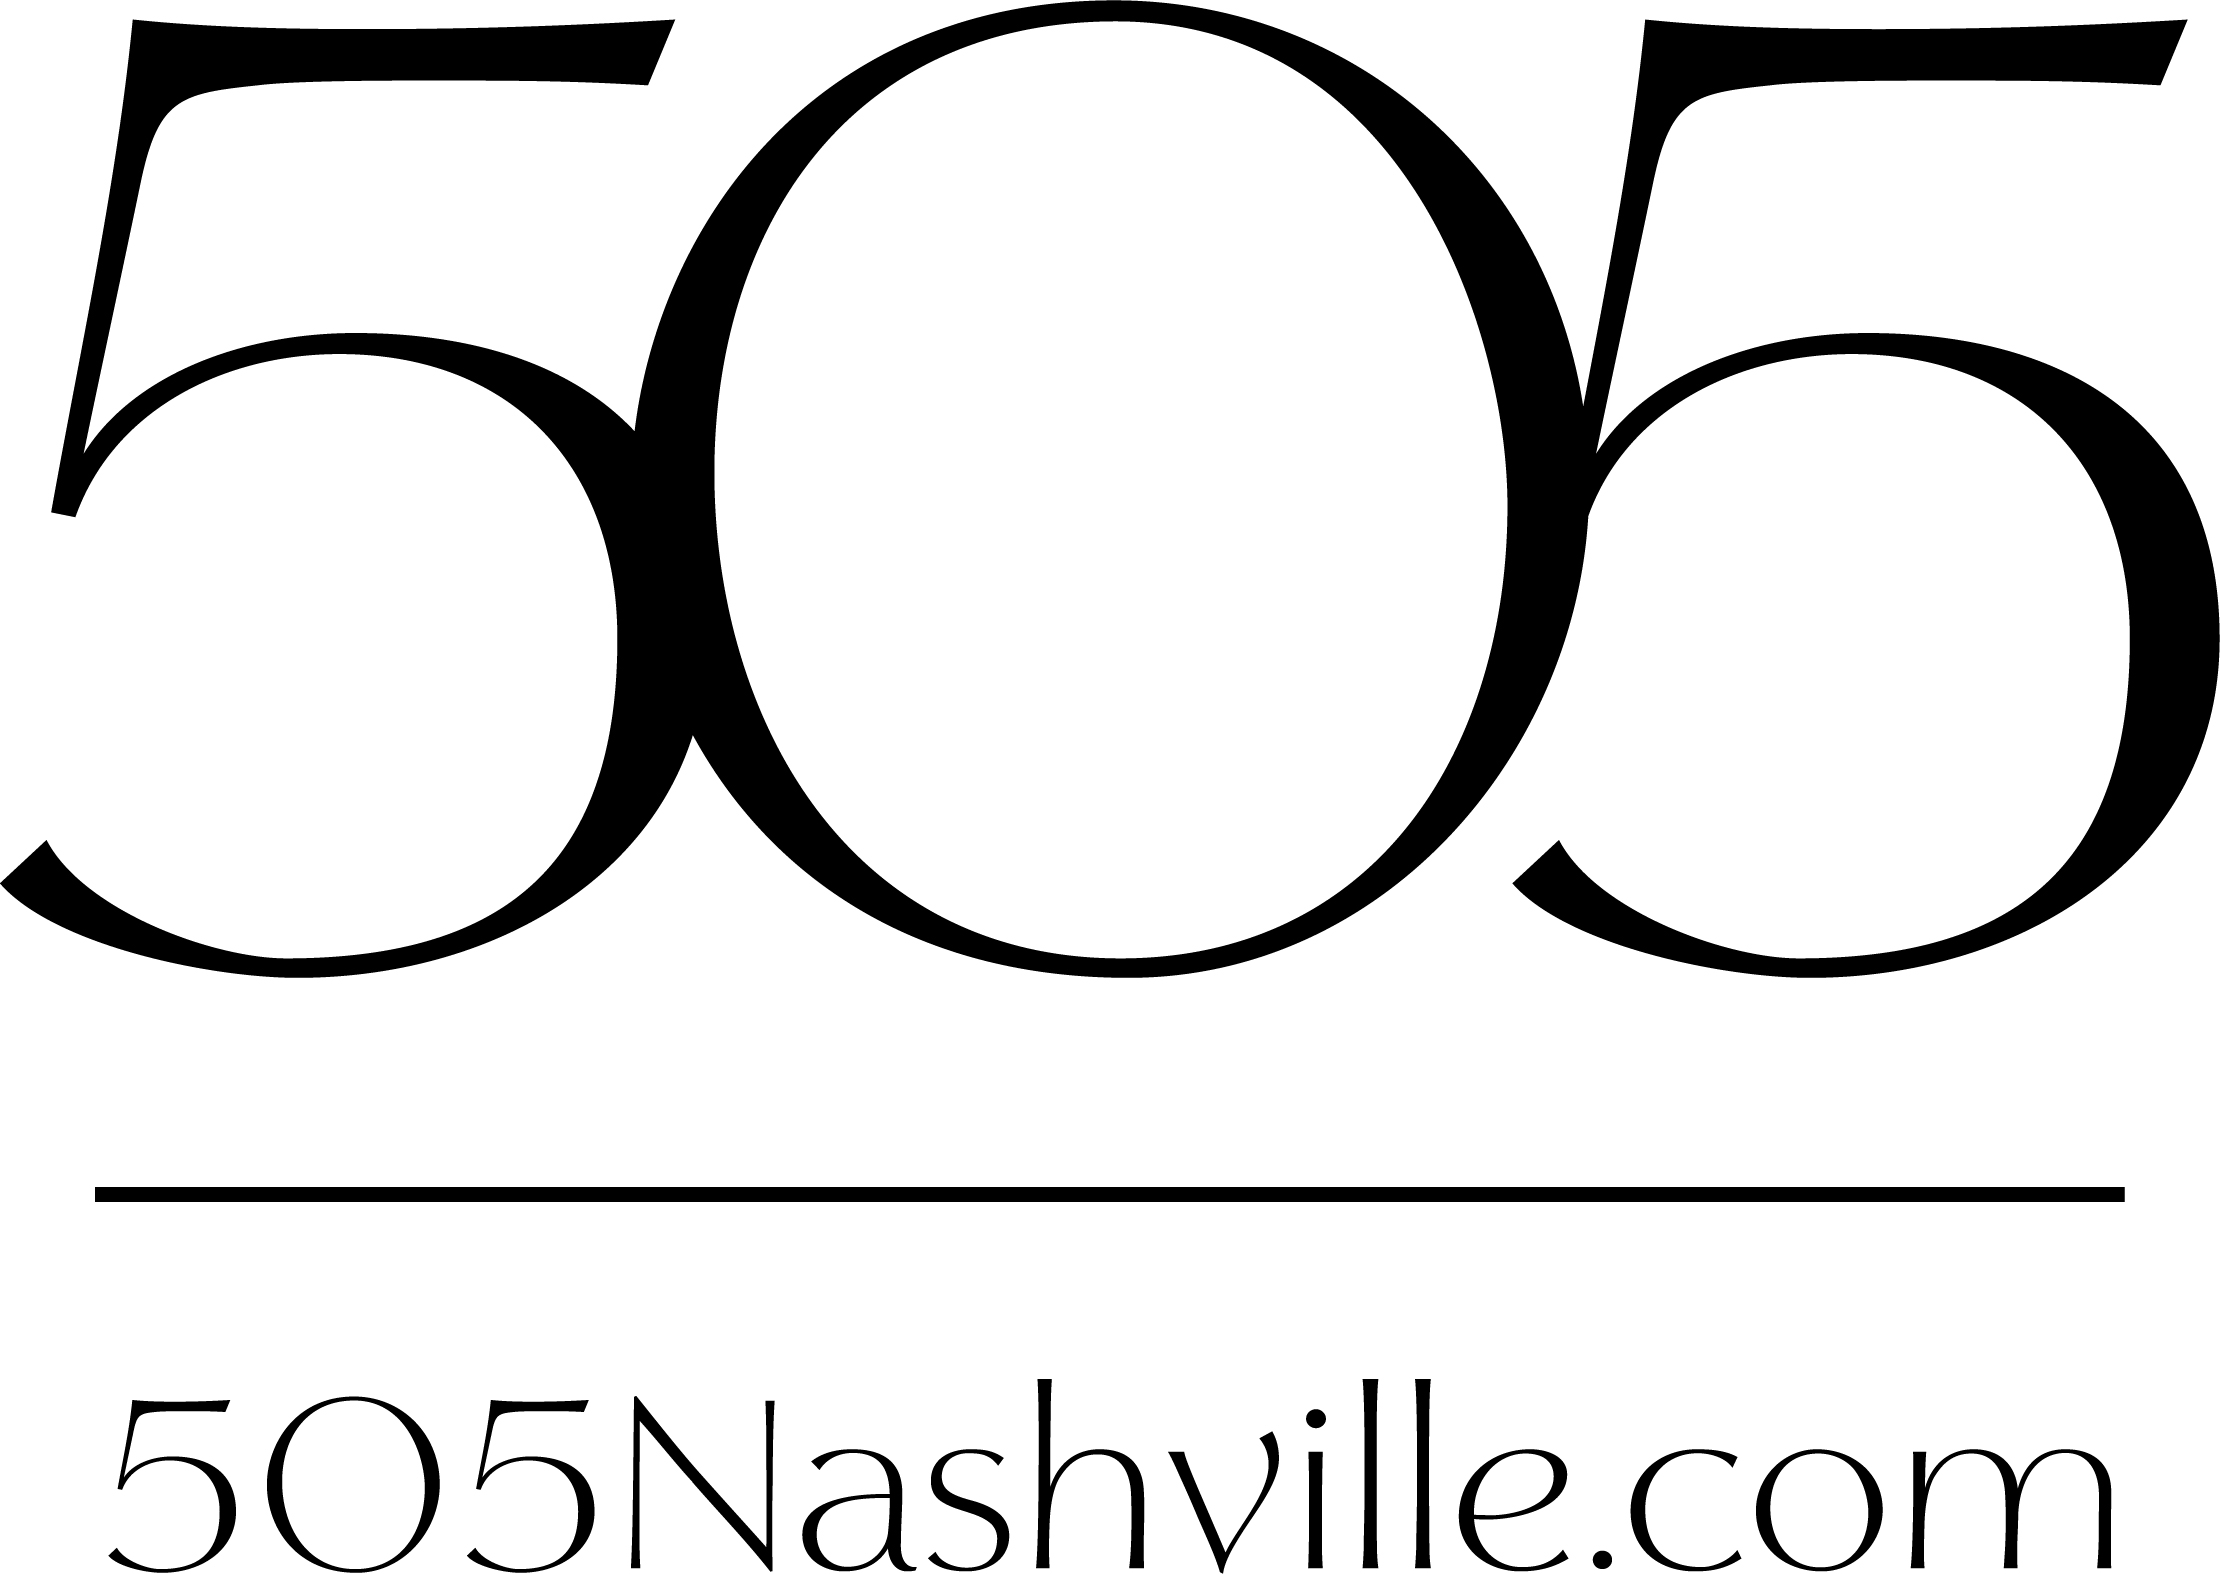 505-Nashville Logo - Copy.jpg